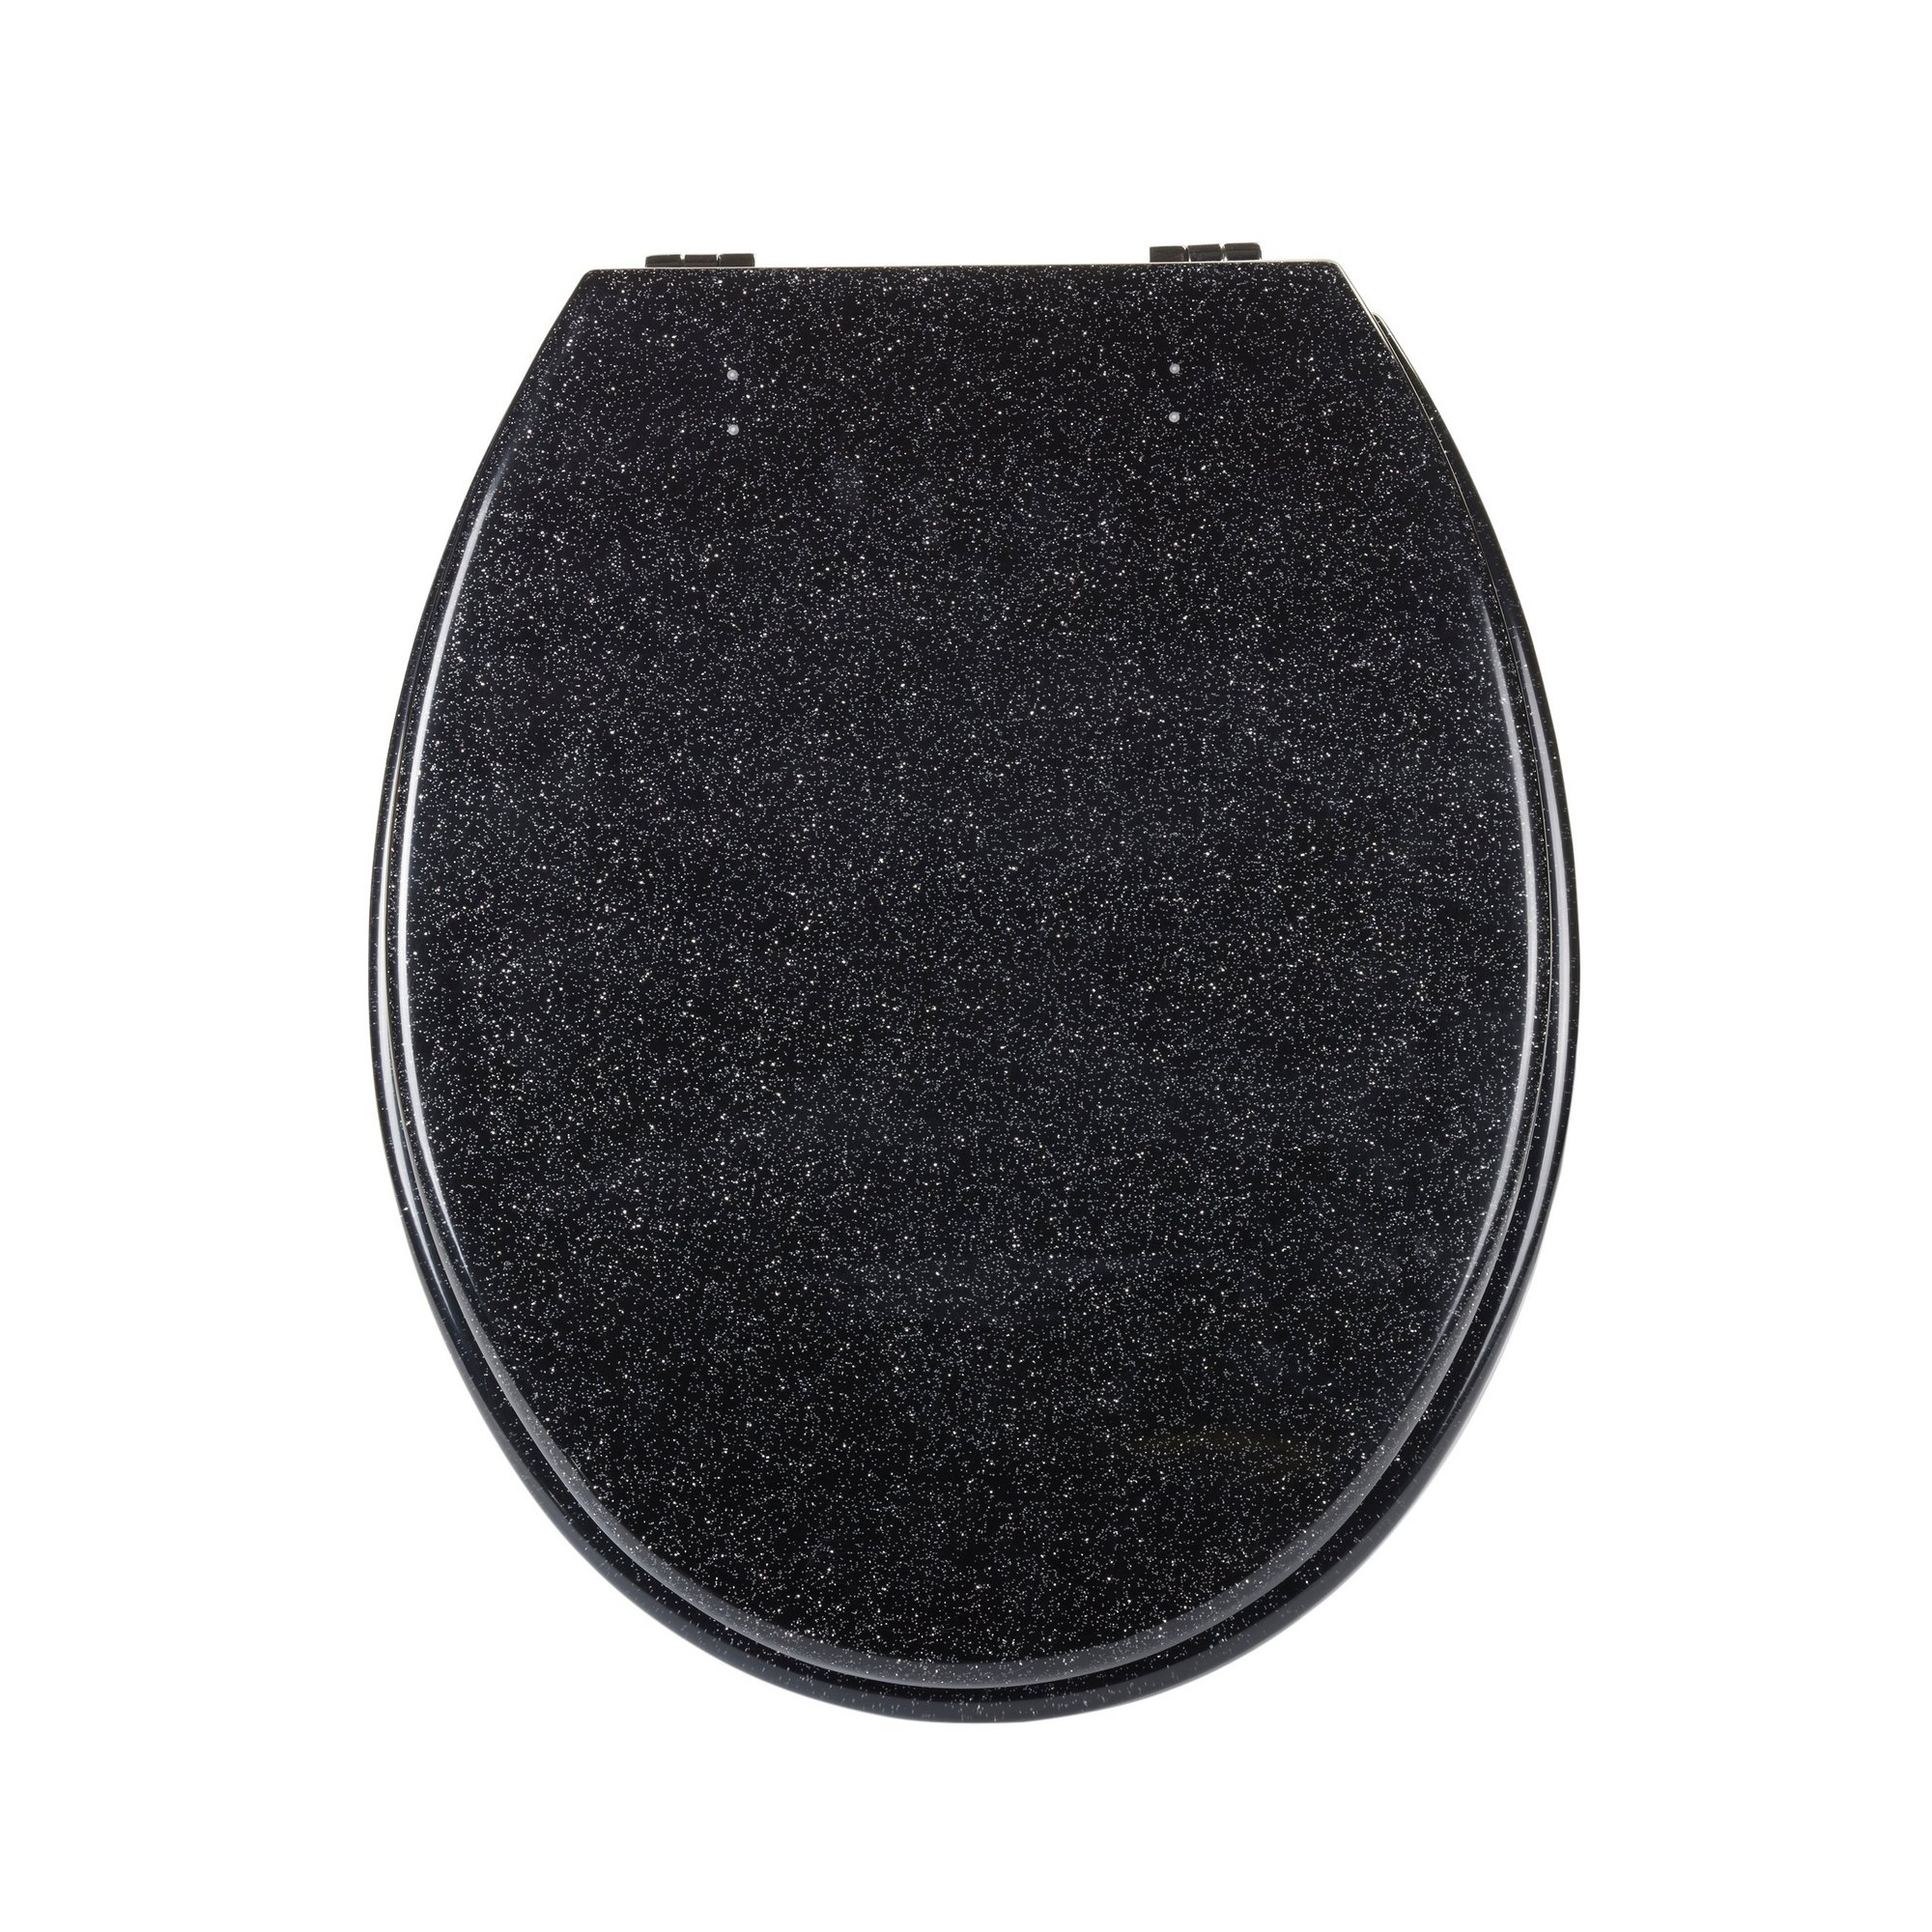 Image of Glitter Toilet Seat